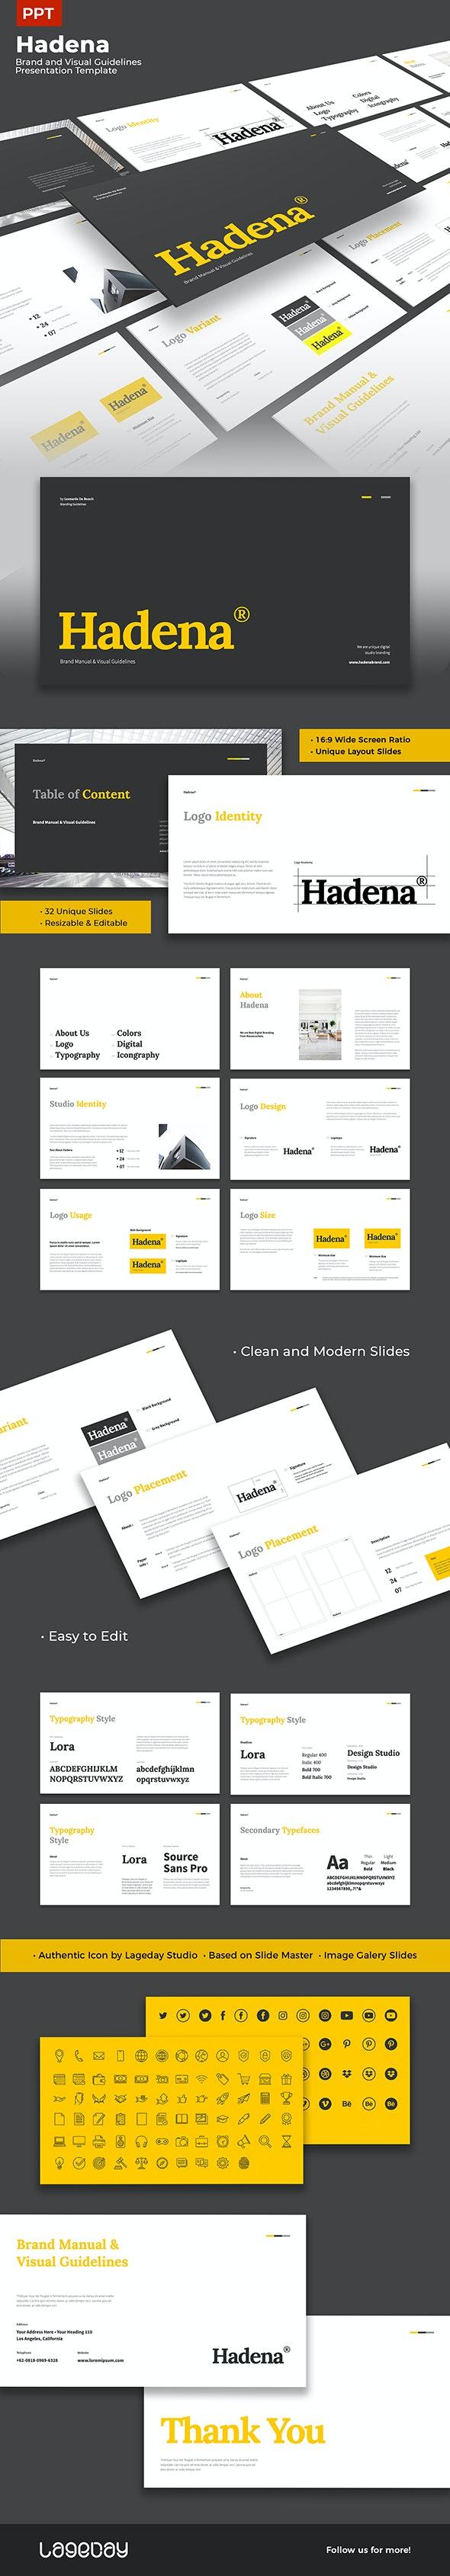 Hadena - Brand Manual & Visual Guidelines Presentation PPT Template - PowerPoint Templates Presentation Templates